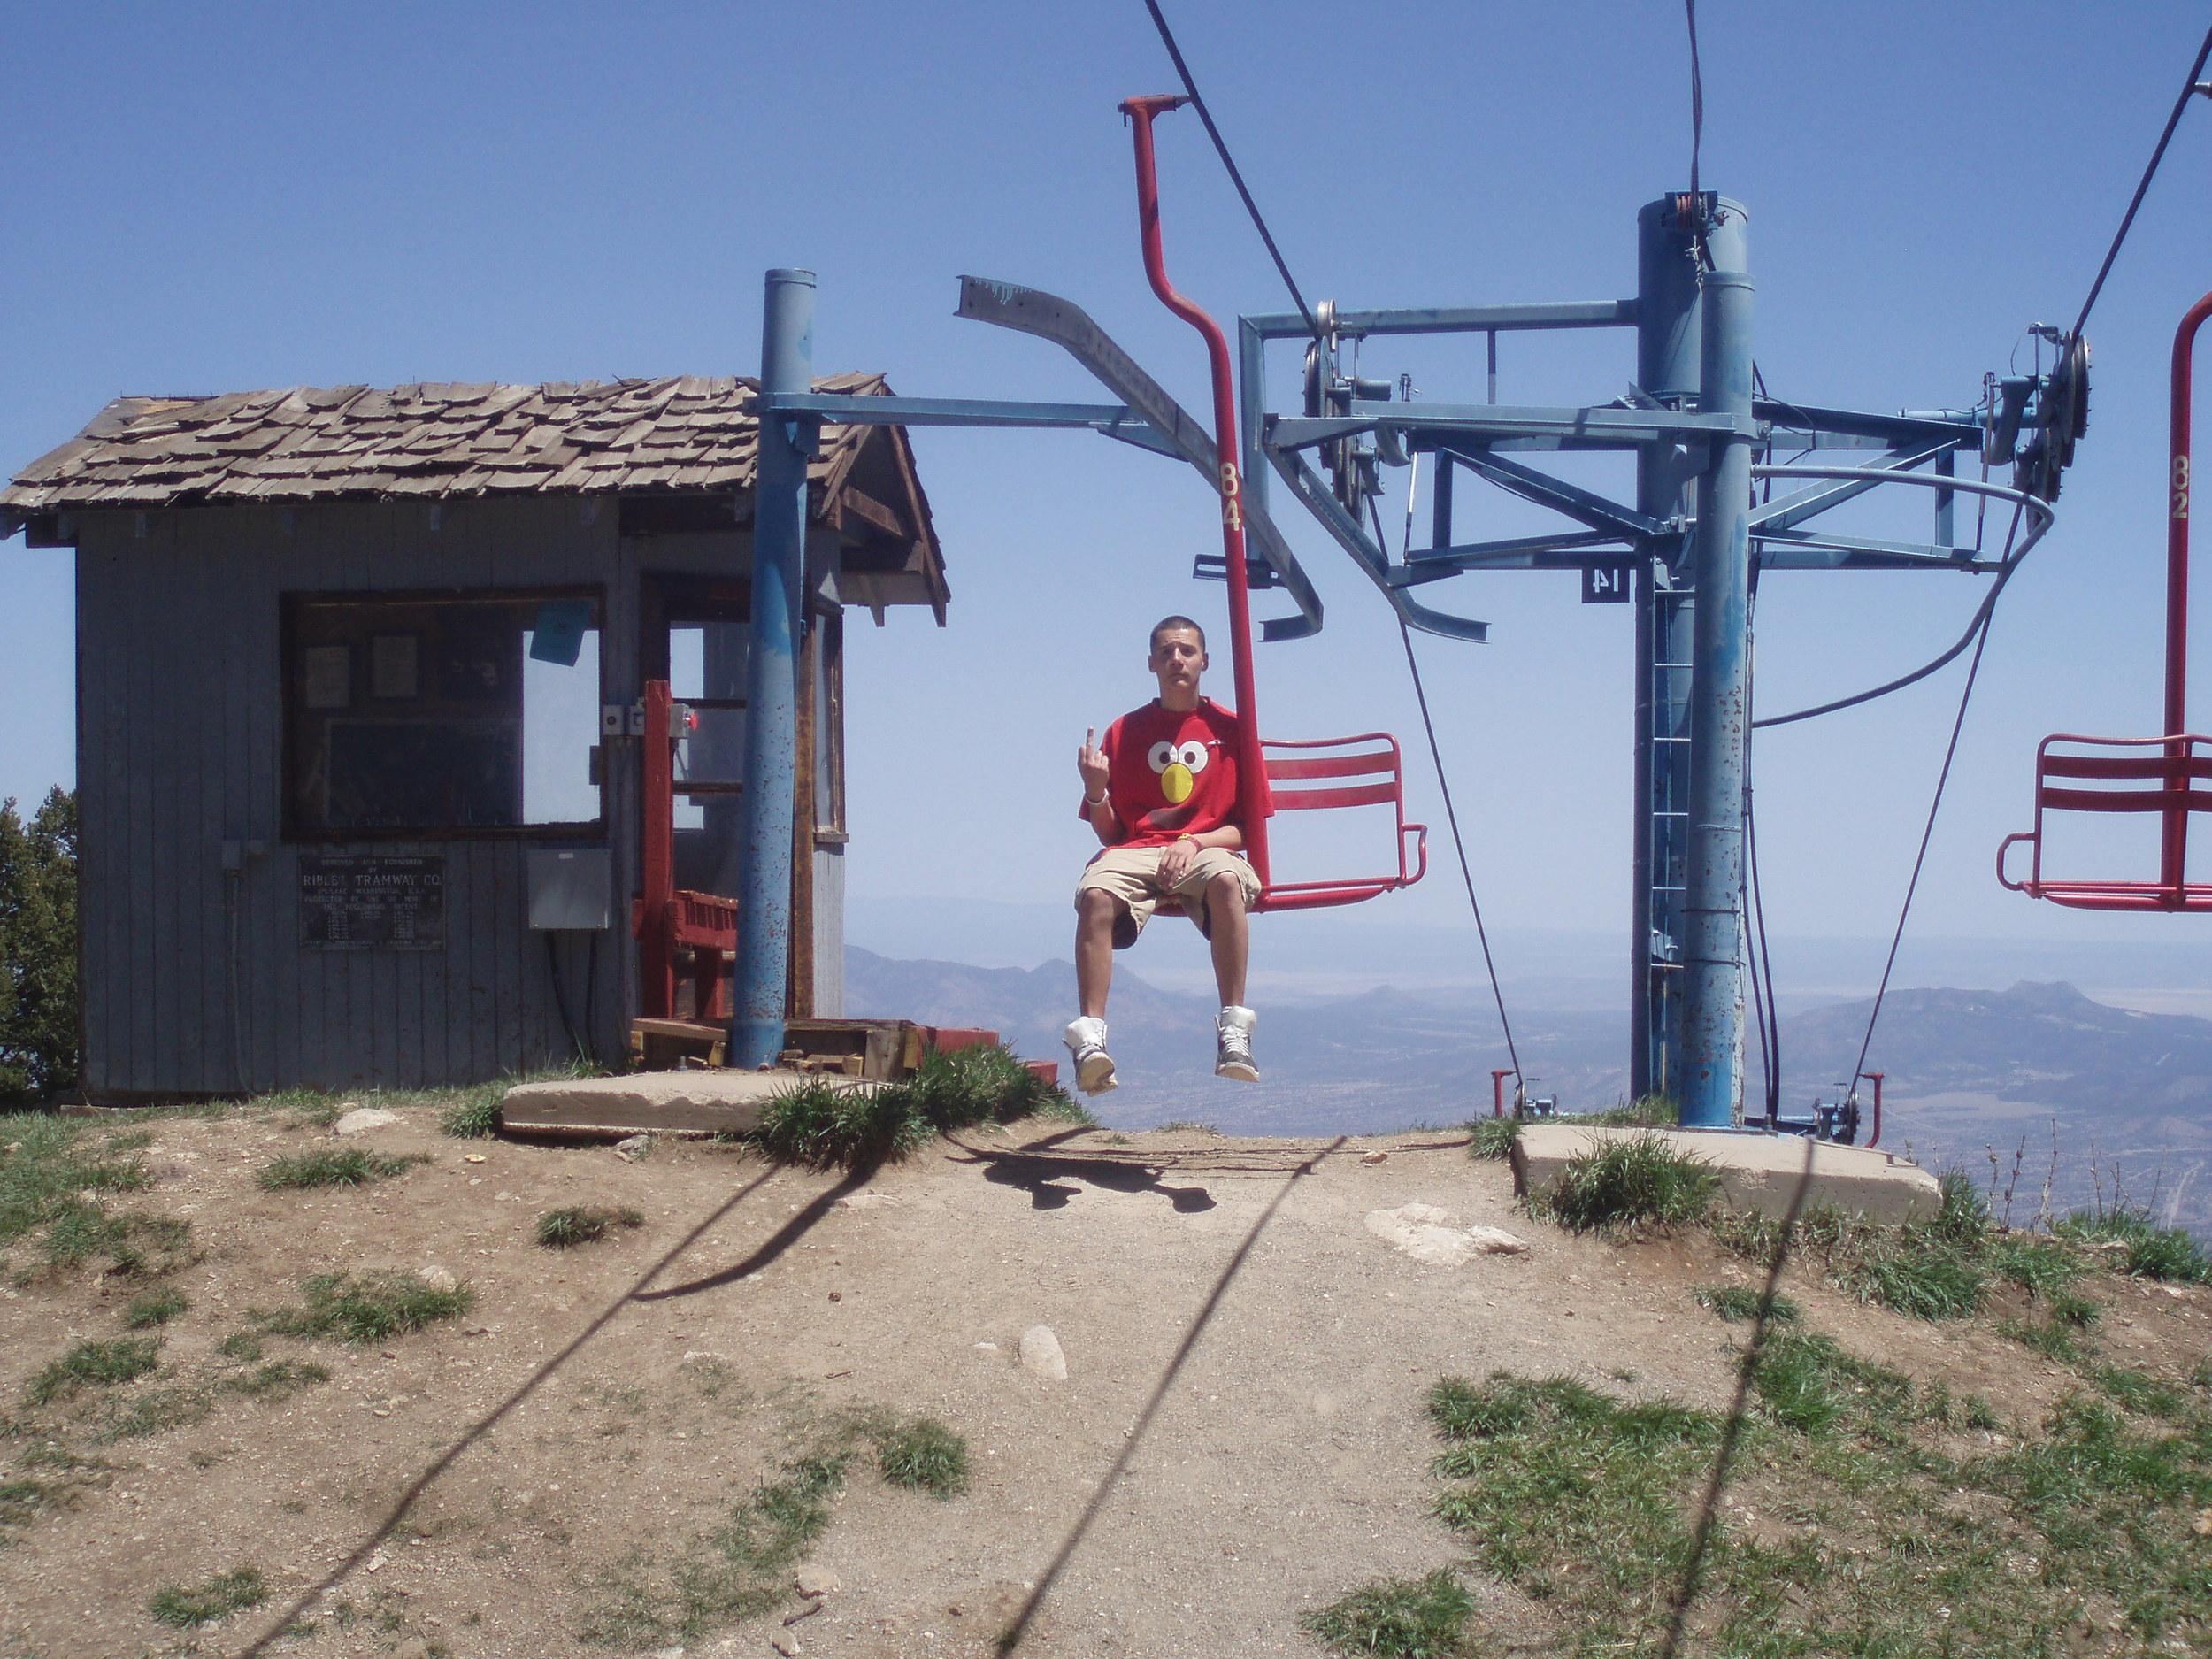 Skandia Ski area above Albuquerque. NM